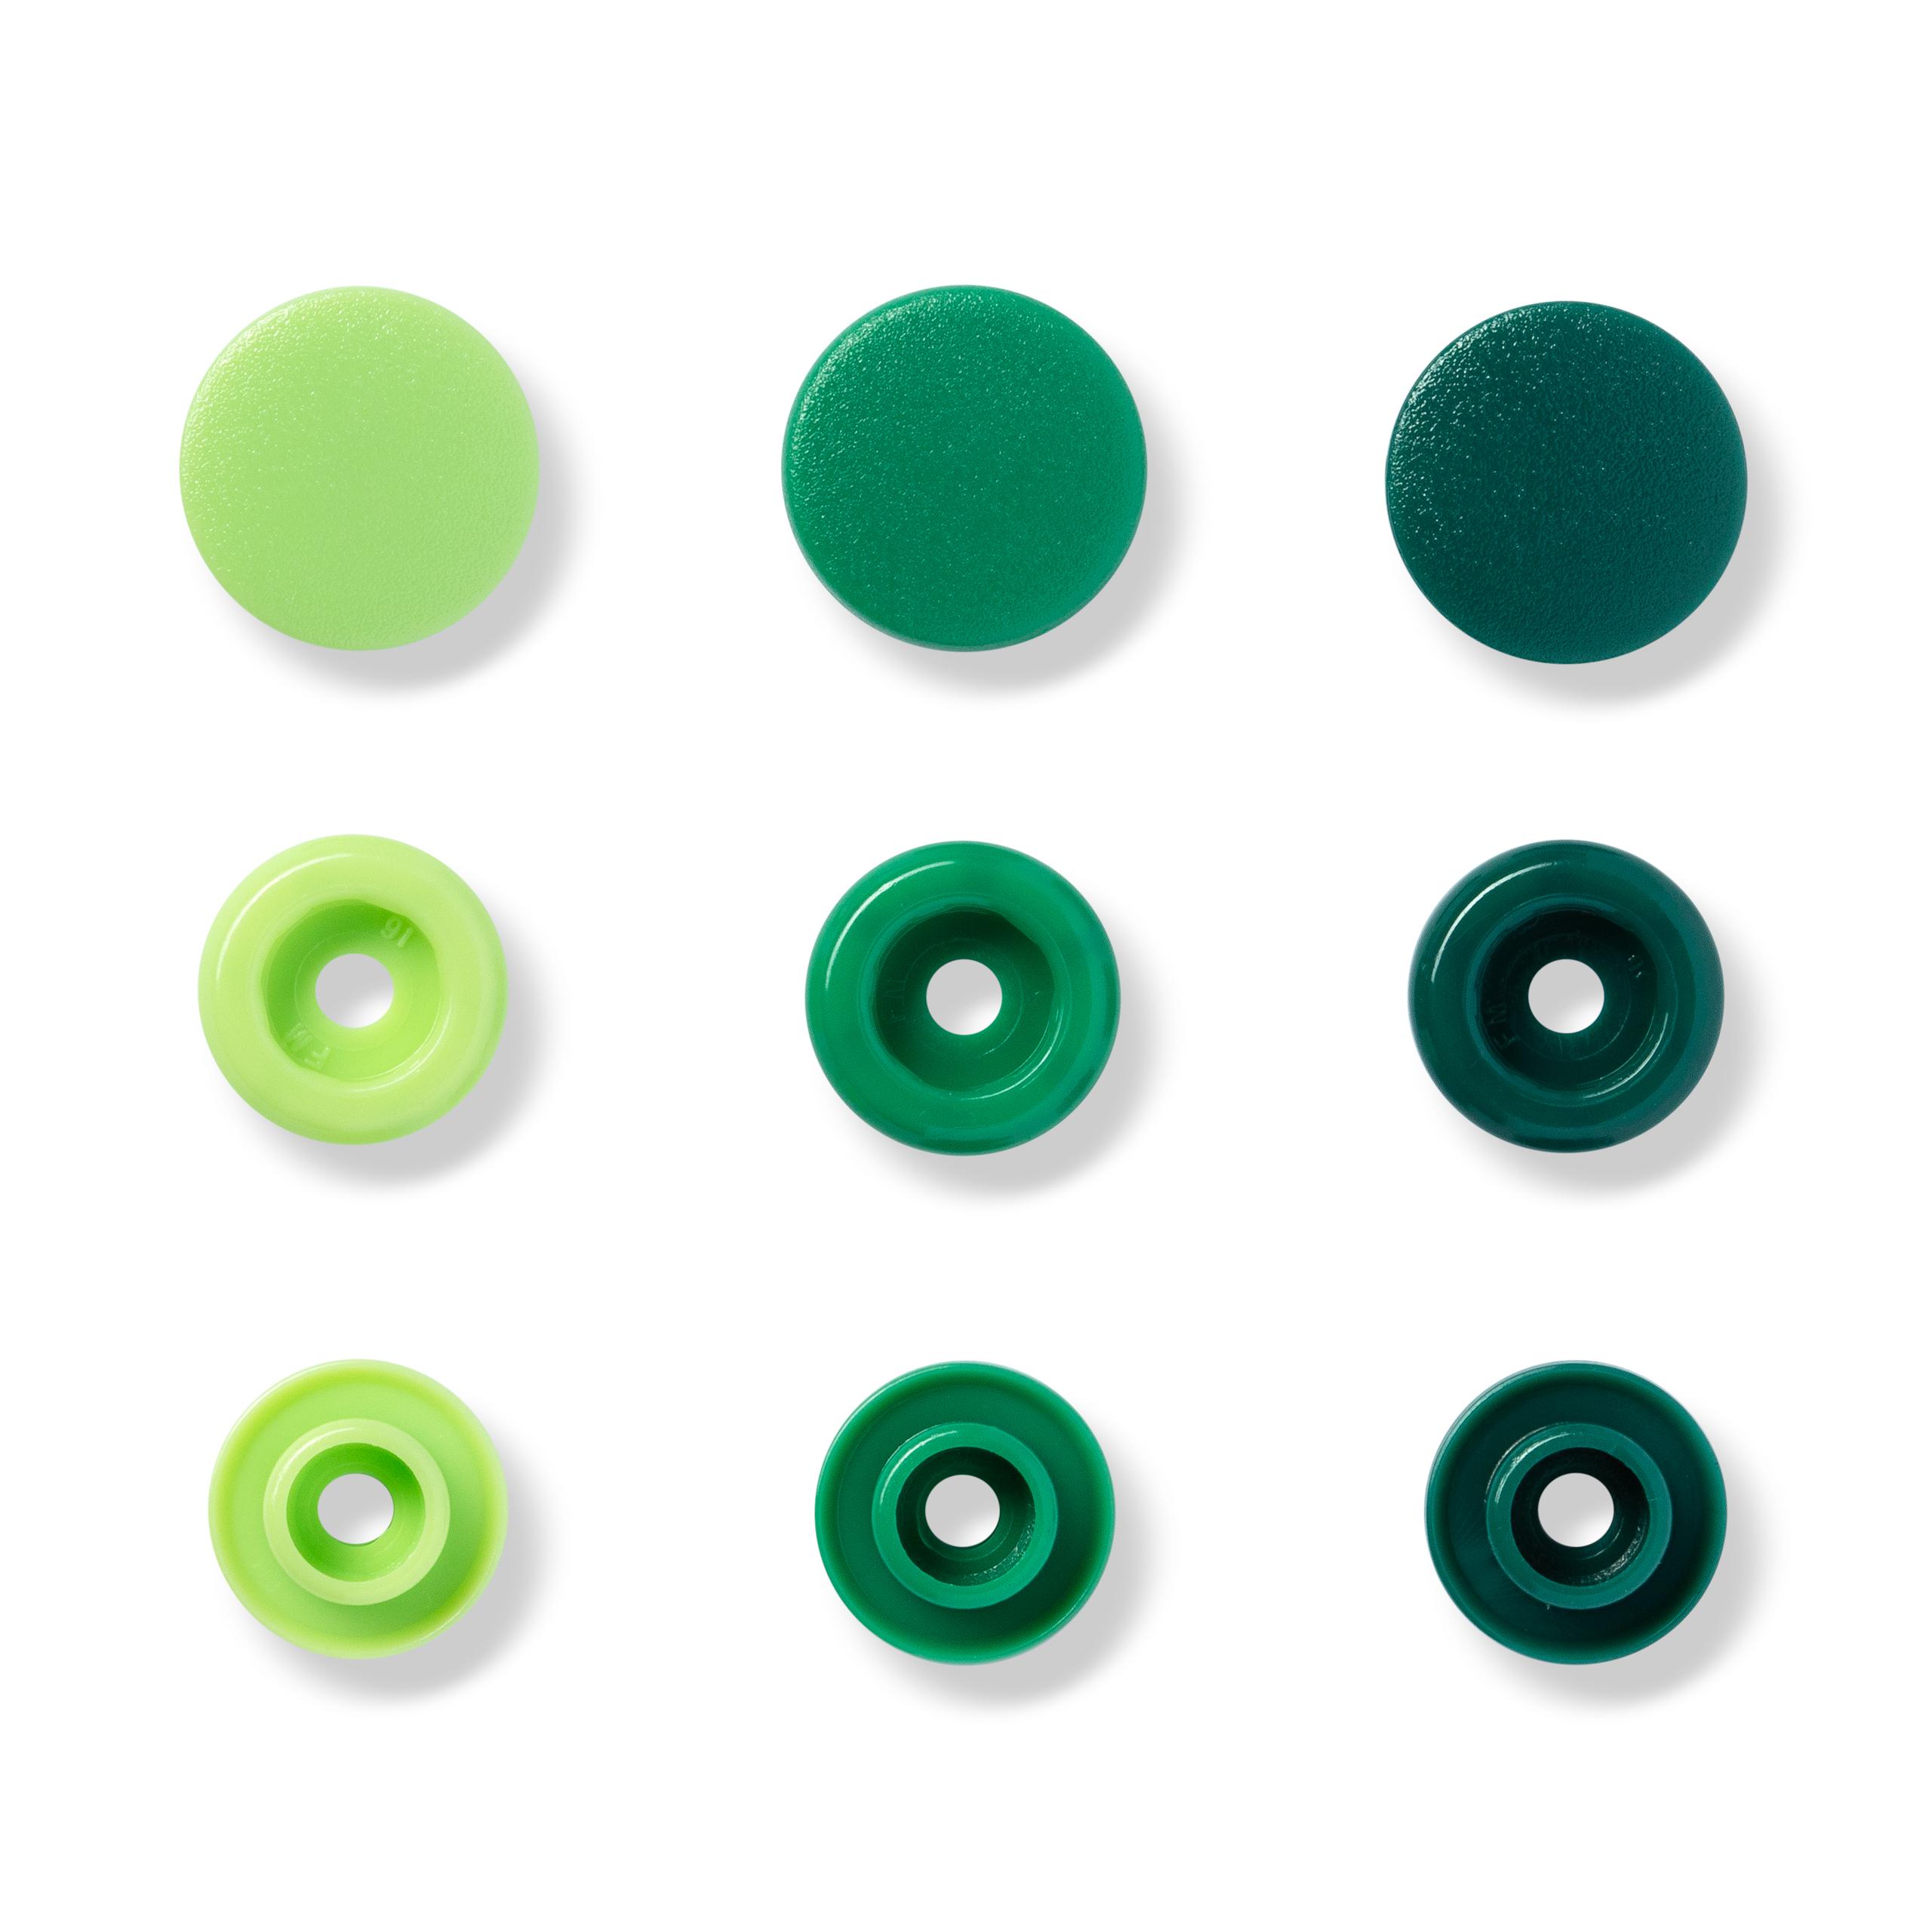 "Druckknopf Color Snaps, grün, ""Prym-Love"", Prym - Art. 393001"